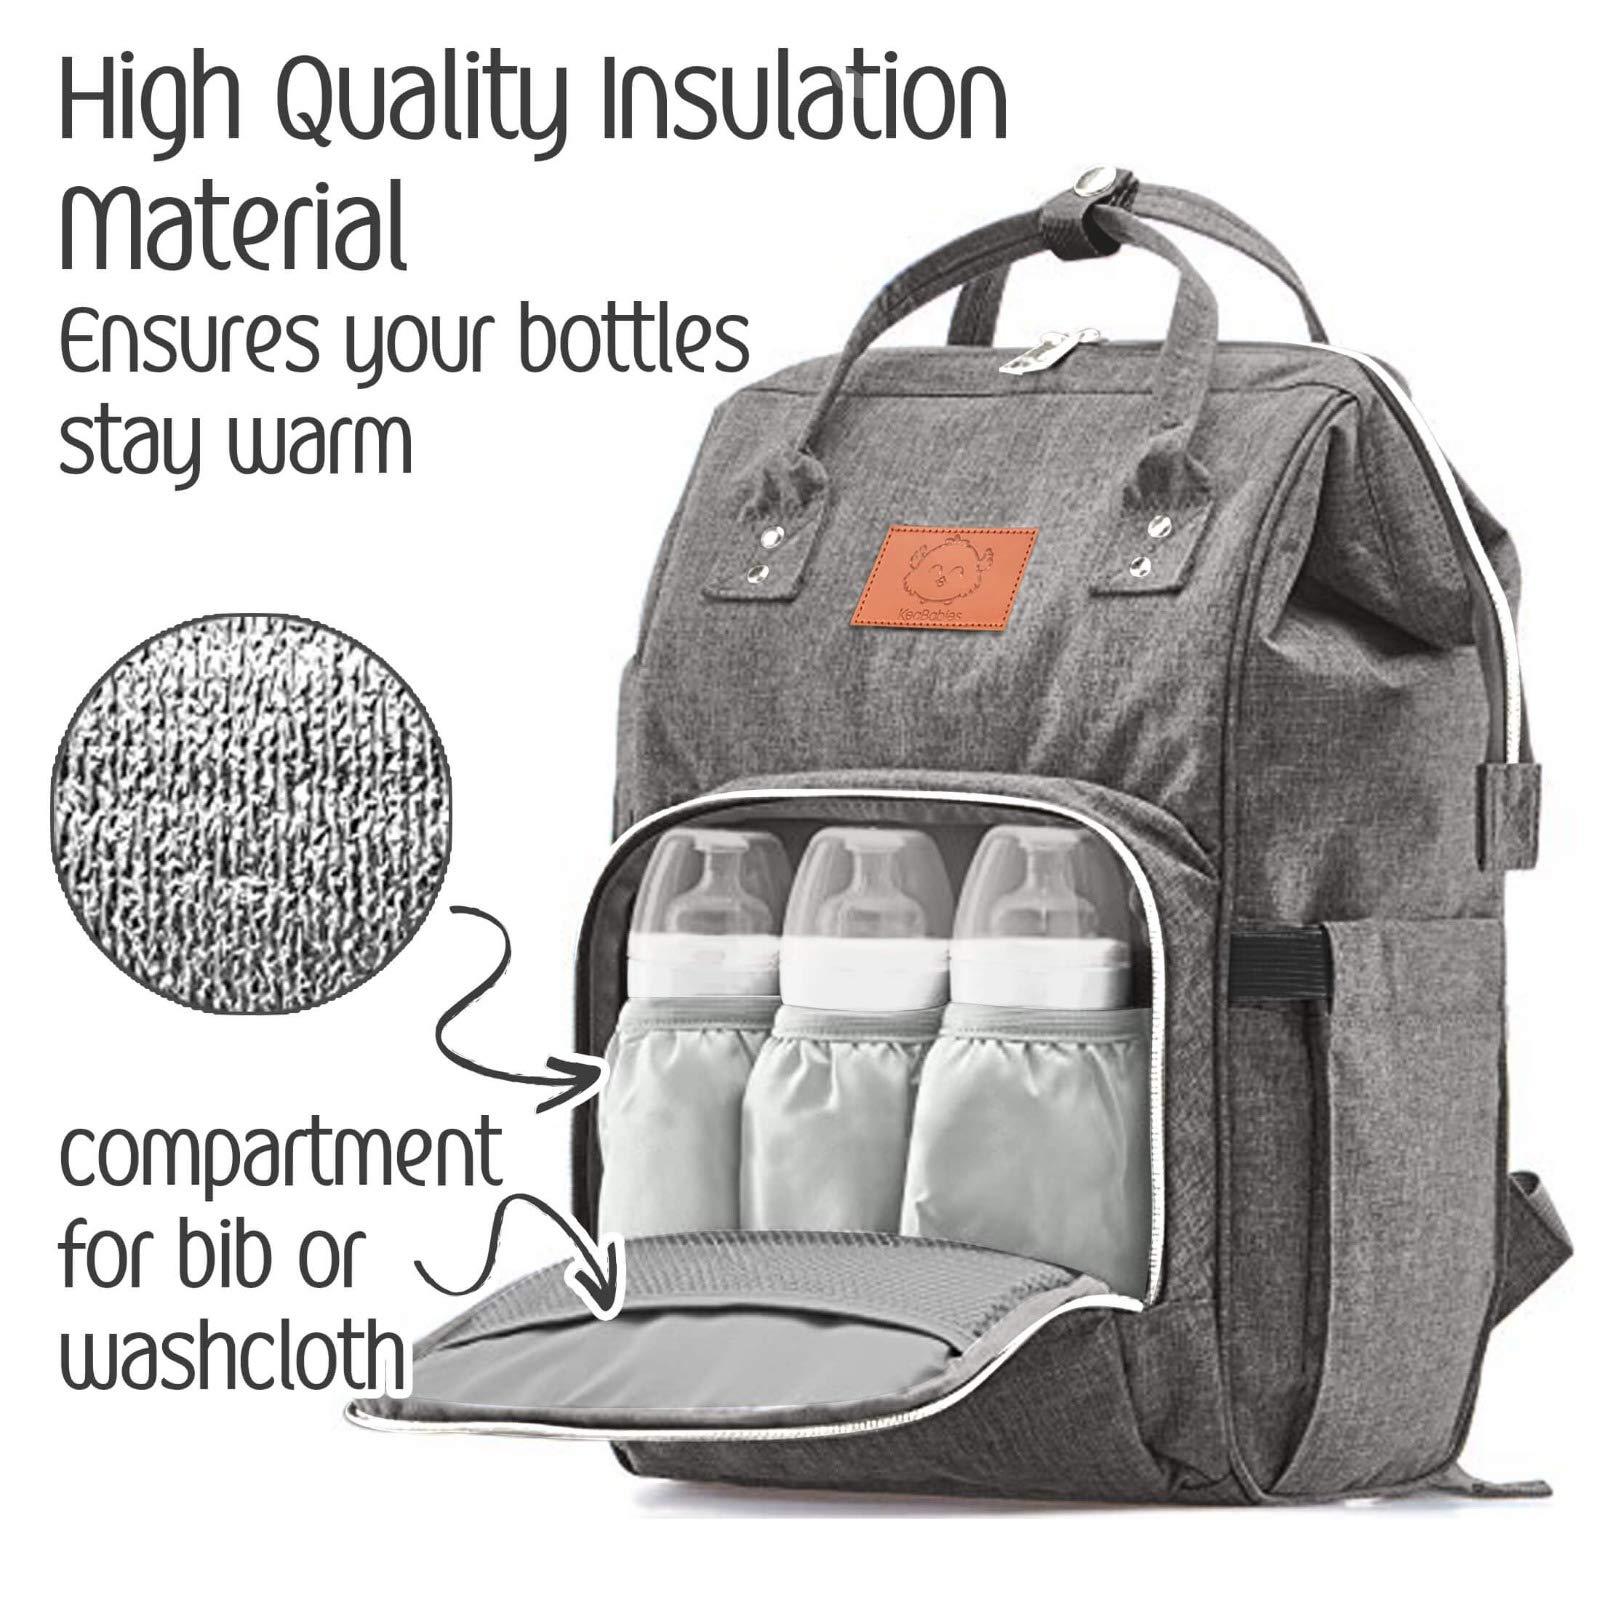 acad9715d5 Baby Diaper Bag Backpack – Multi-Function Waterproof Travel Baby Bags for  Mom, Dad ...